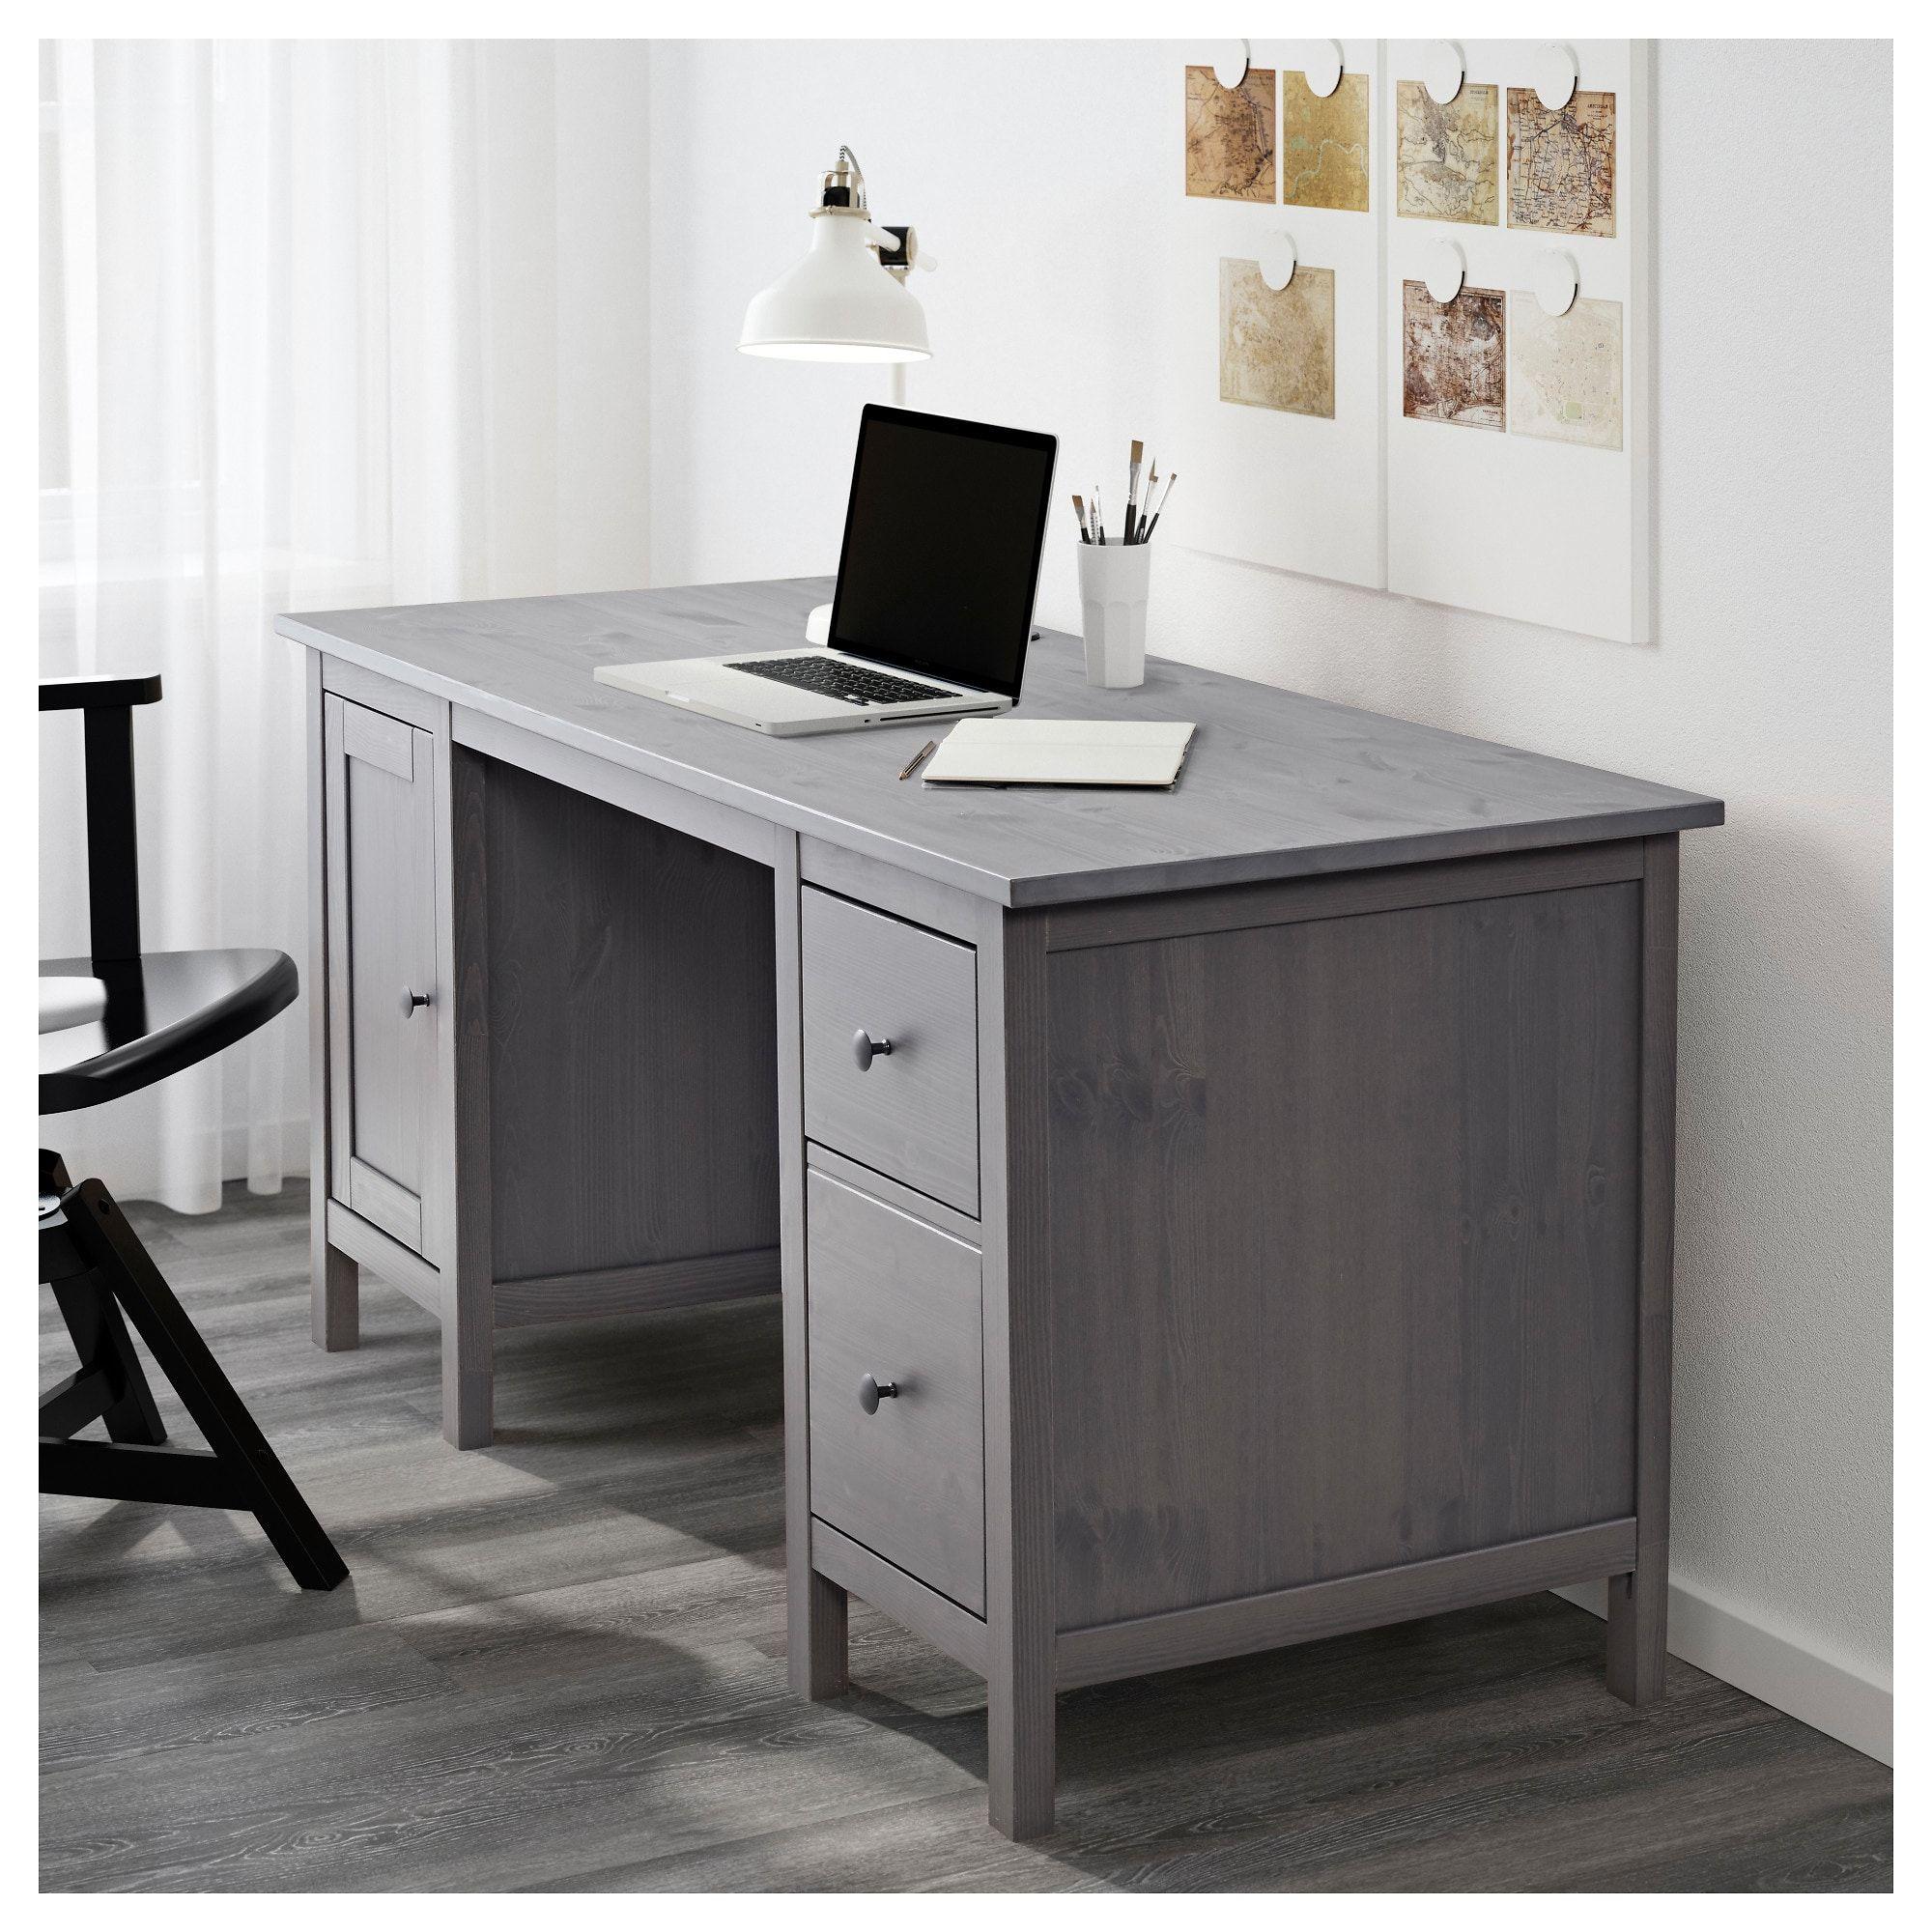 Hemnes Desk Gray Dark Gray Stained 61x25 5 8 Ikea Grey Desk Ikea Hemnes Desk Hemnes